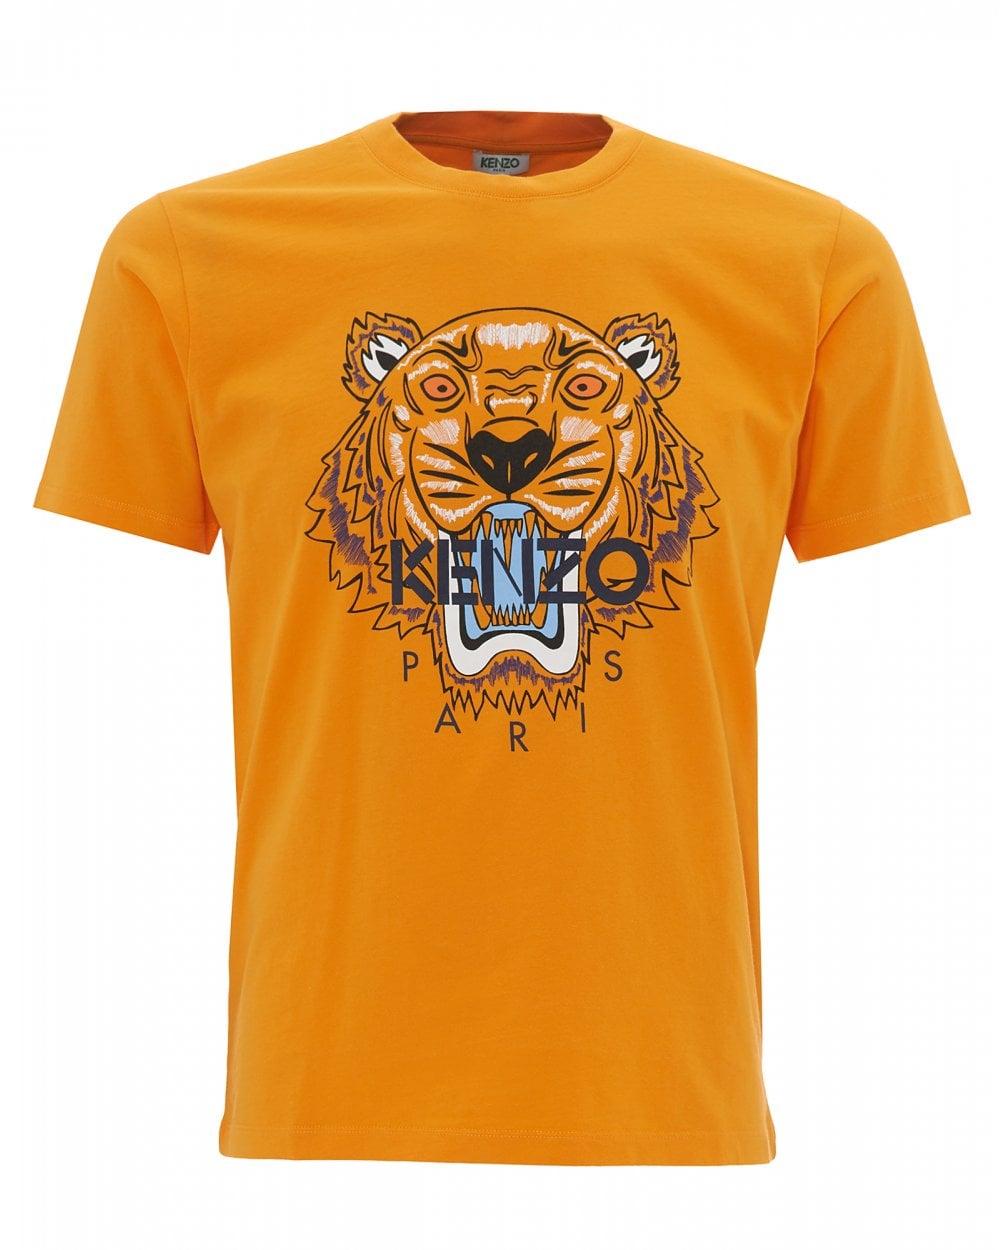 0e1f1837 Kenzo Mens Tiger T-Shirt, Orange Icon Tee